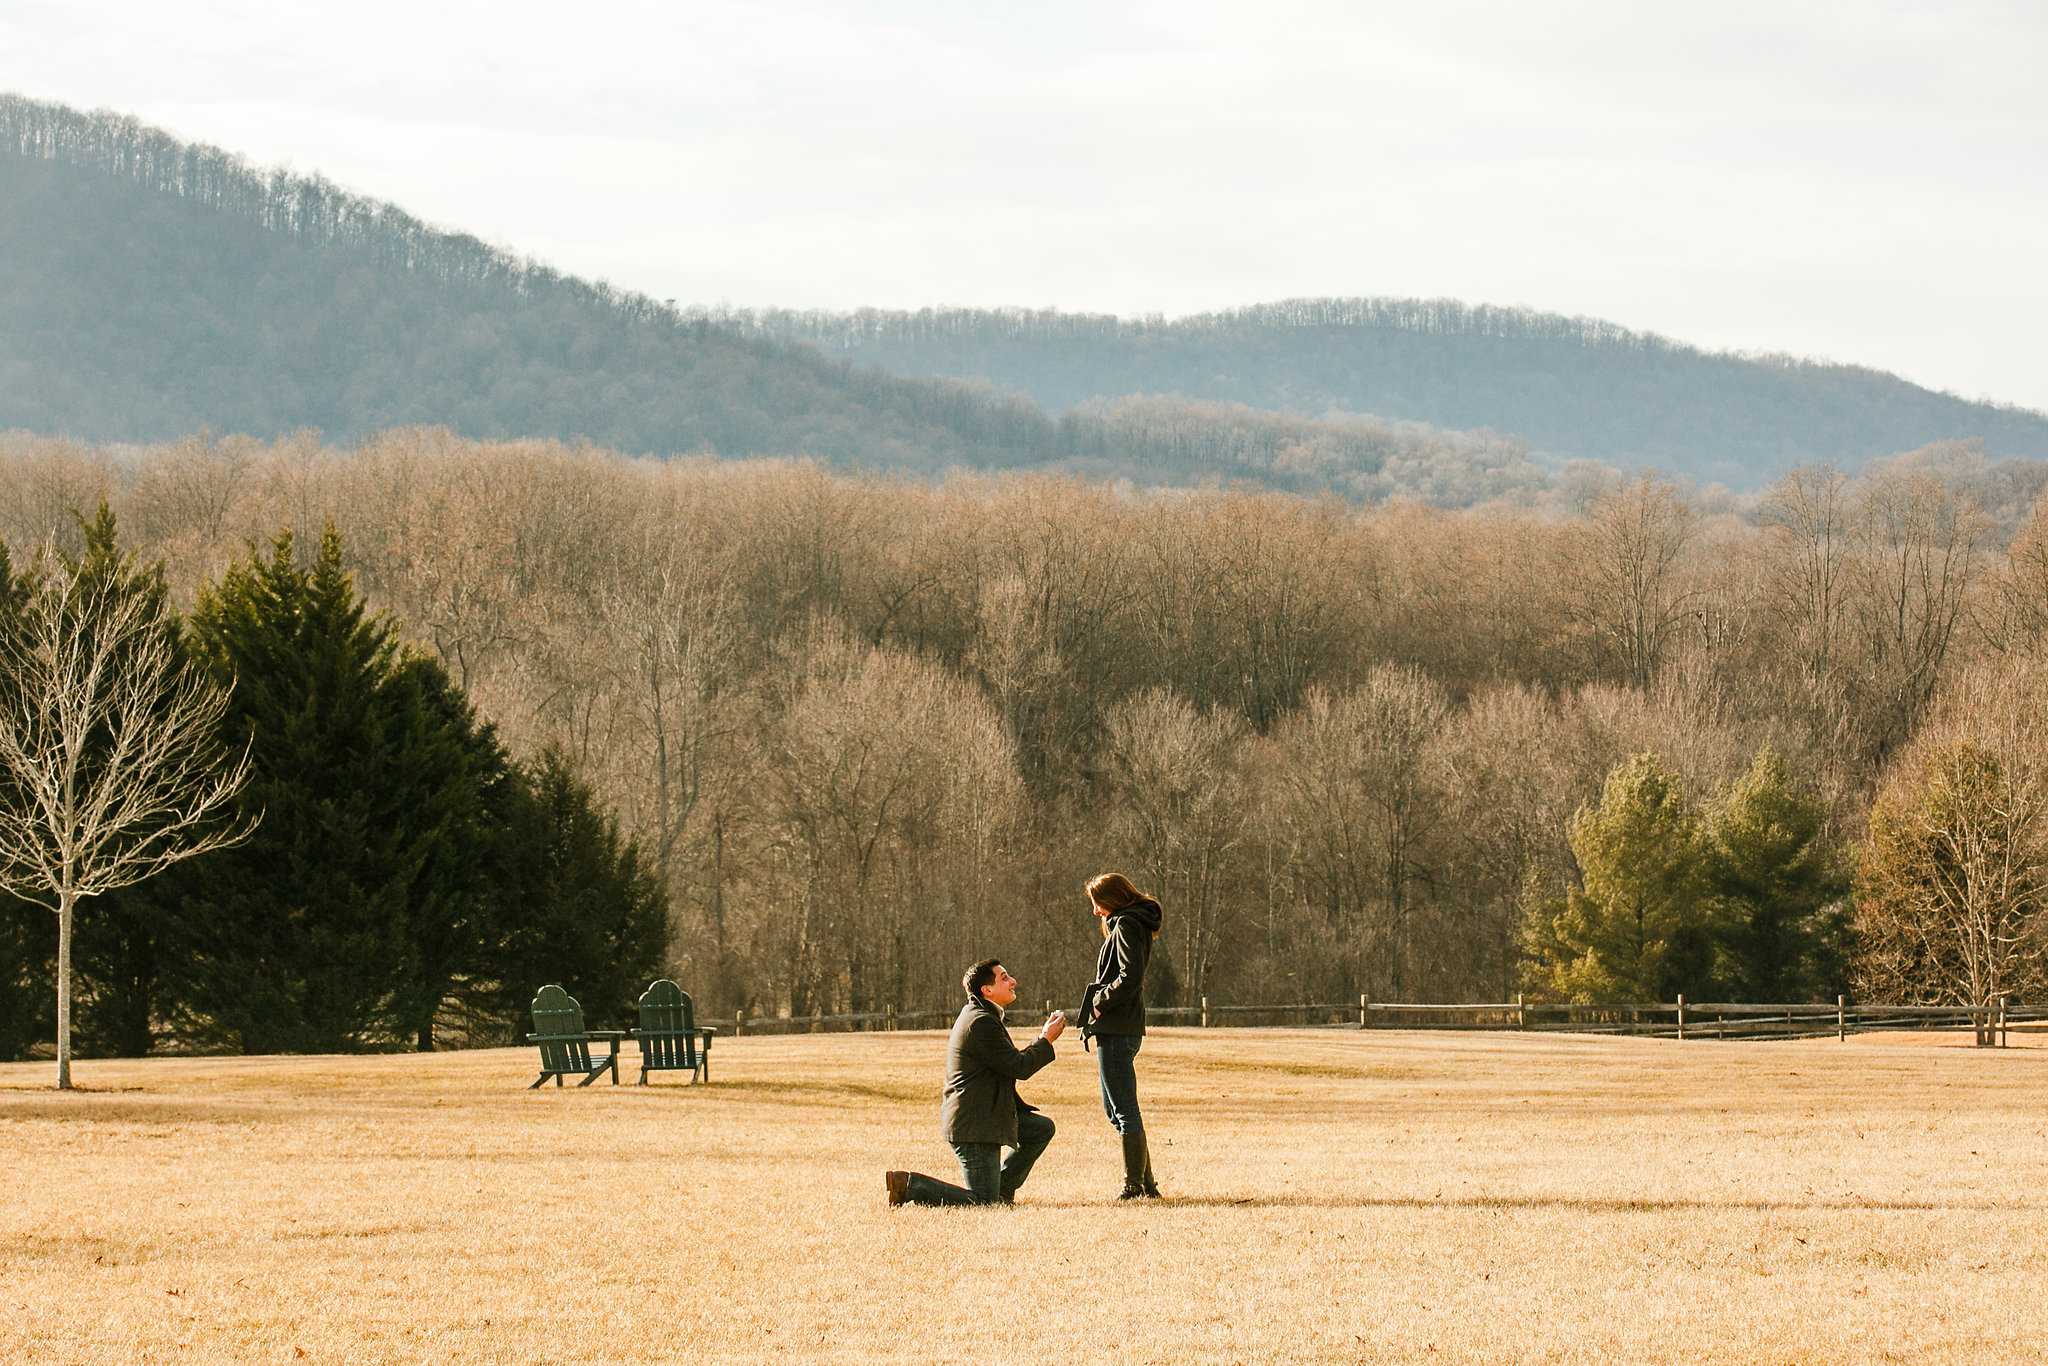 Inn-at-little-washington-surprise-marriage-proposal